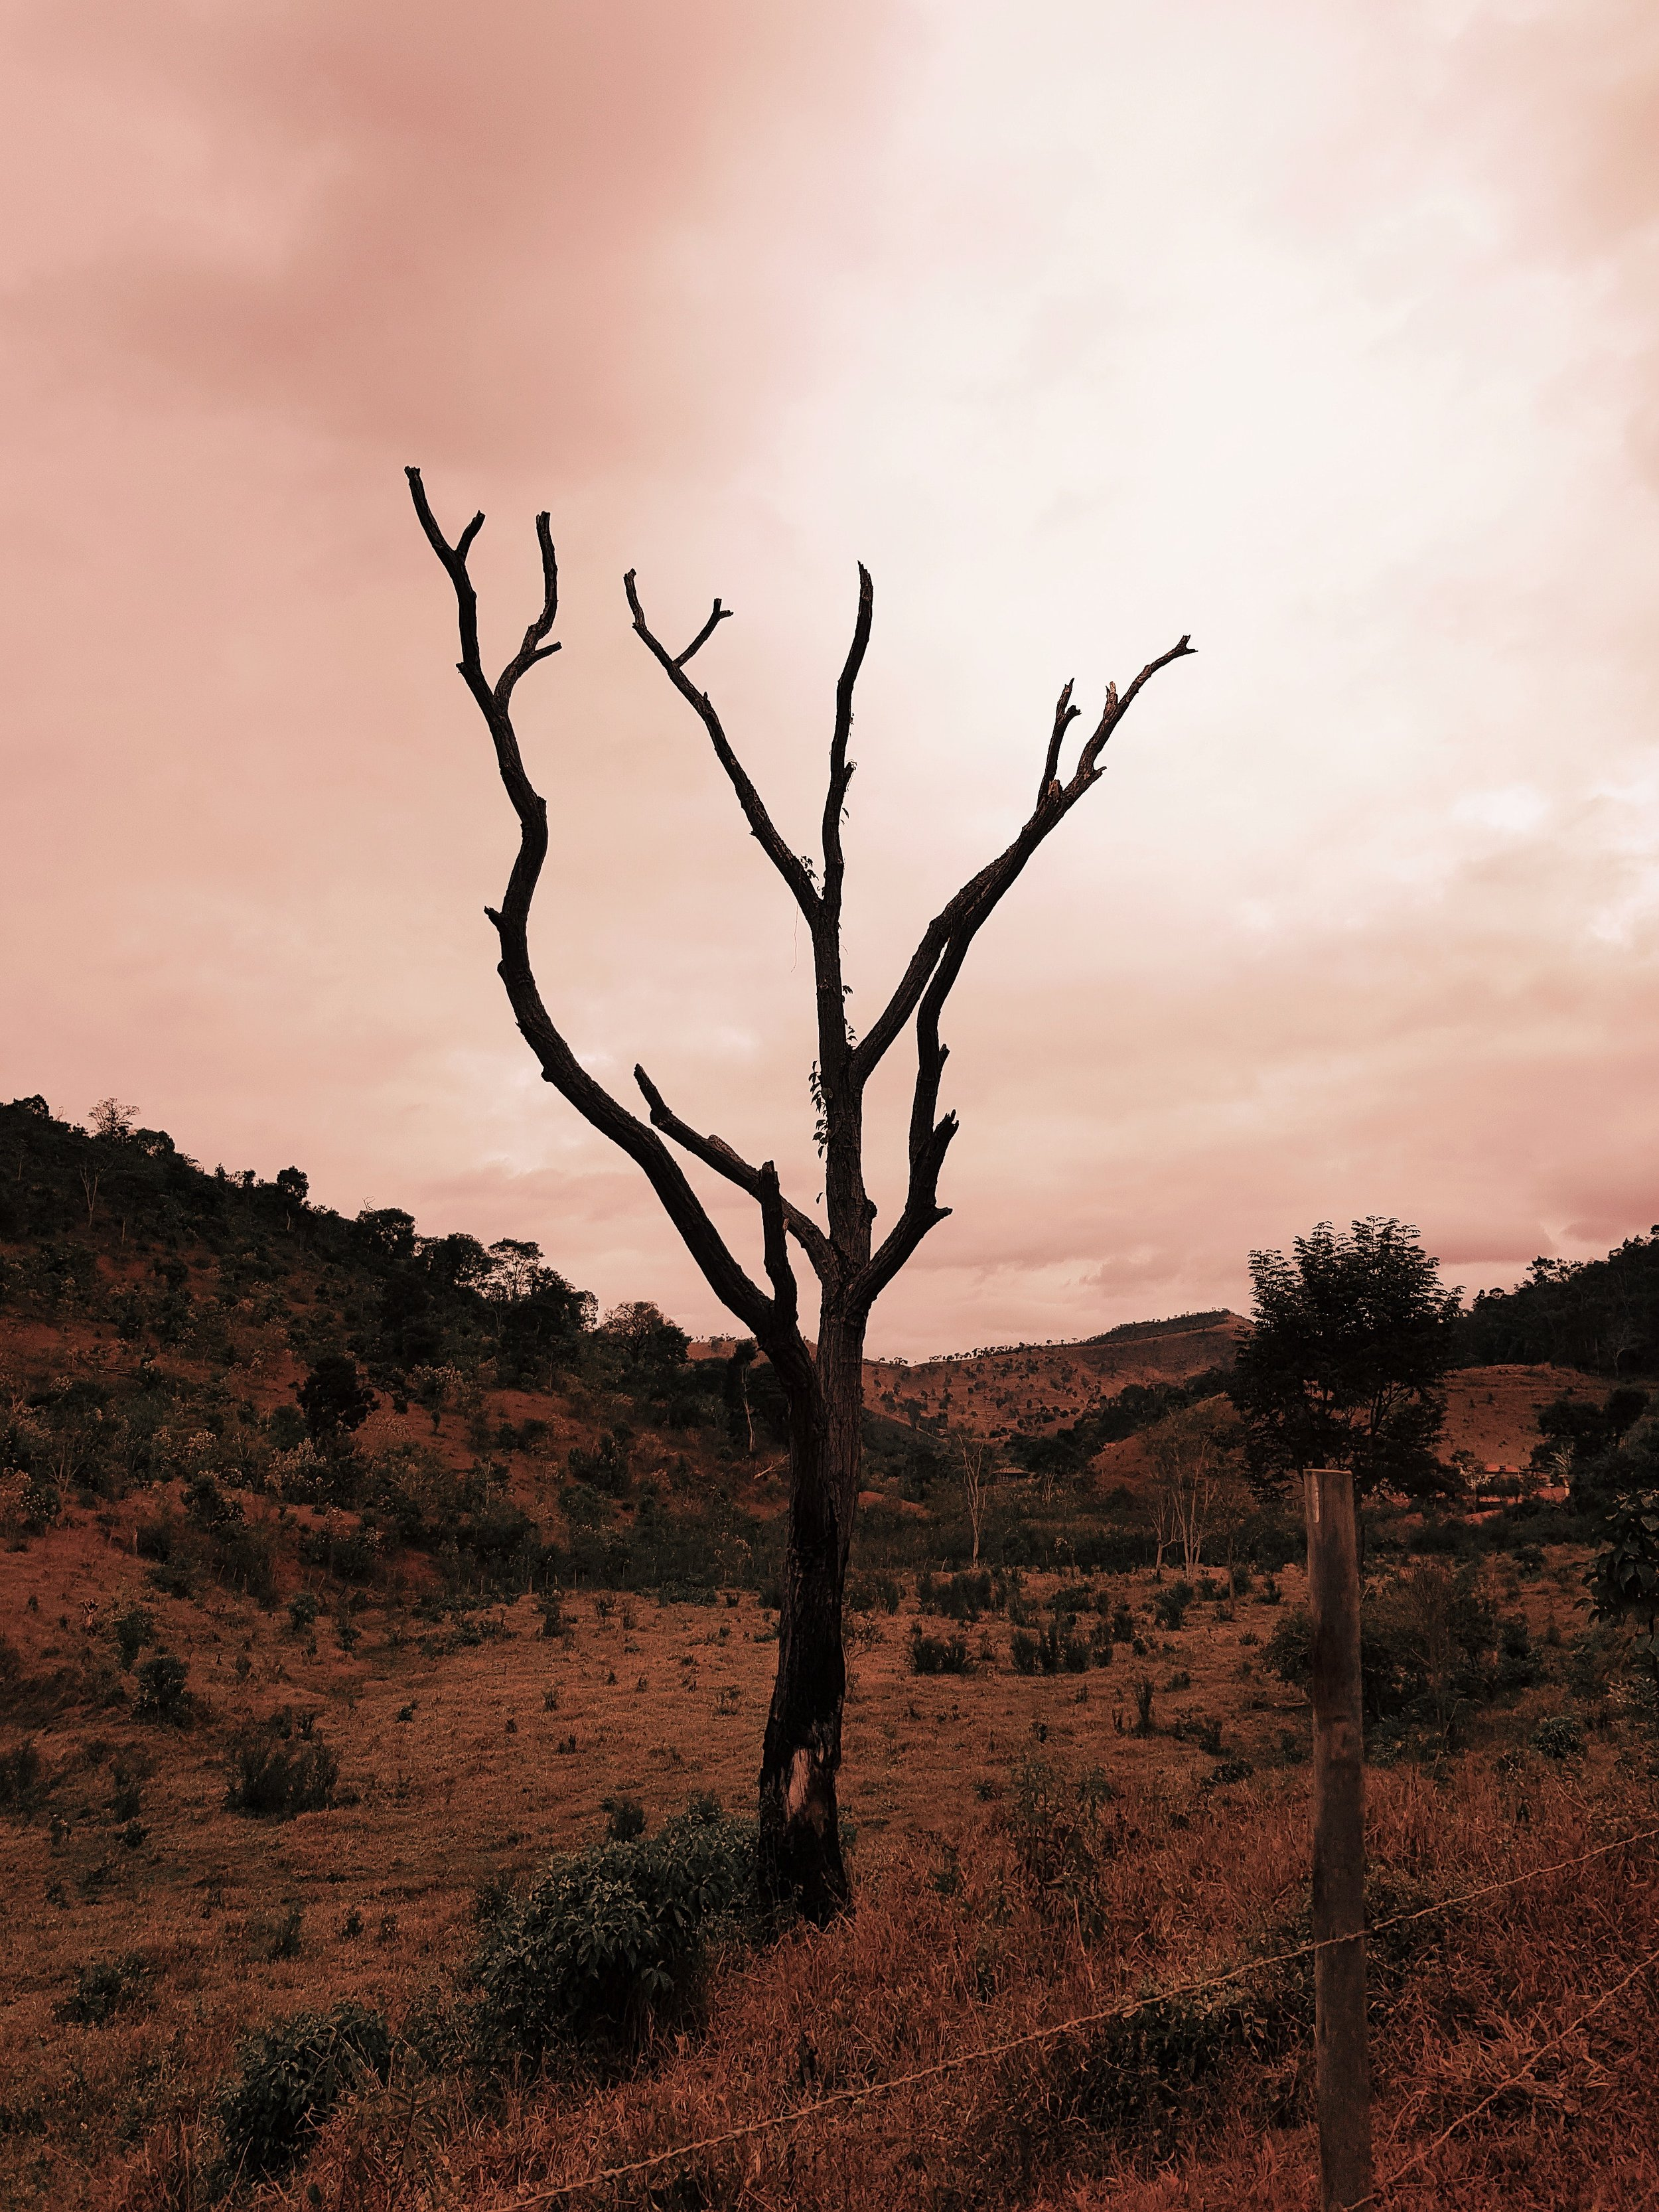 arid-bare-tree-countryside-2764982.jpg